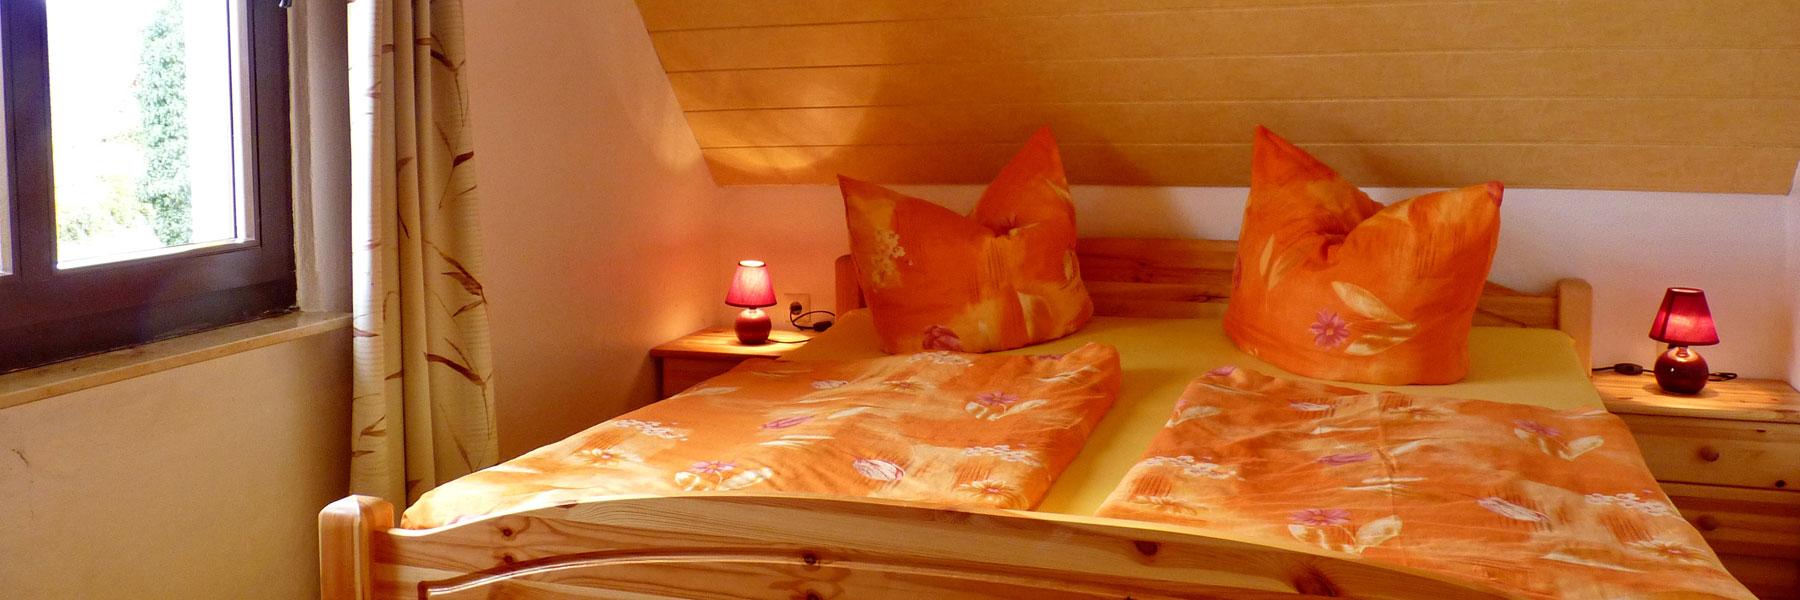 Schlafzimmer - Eis-Café Schumann & Pension